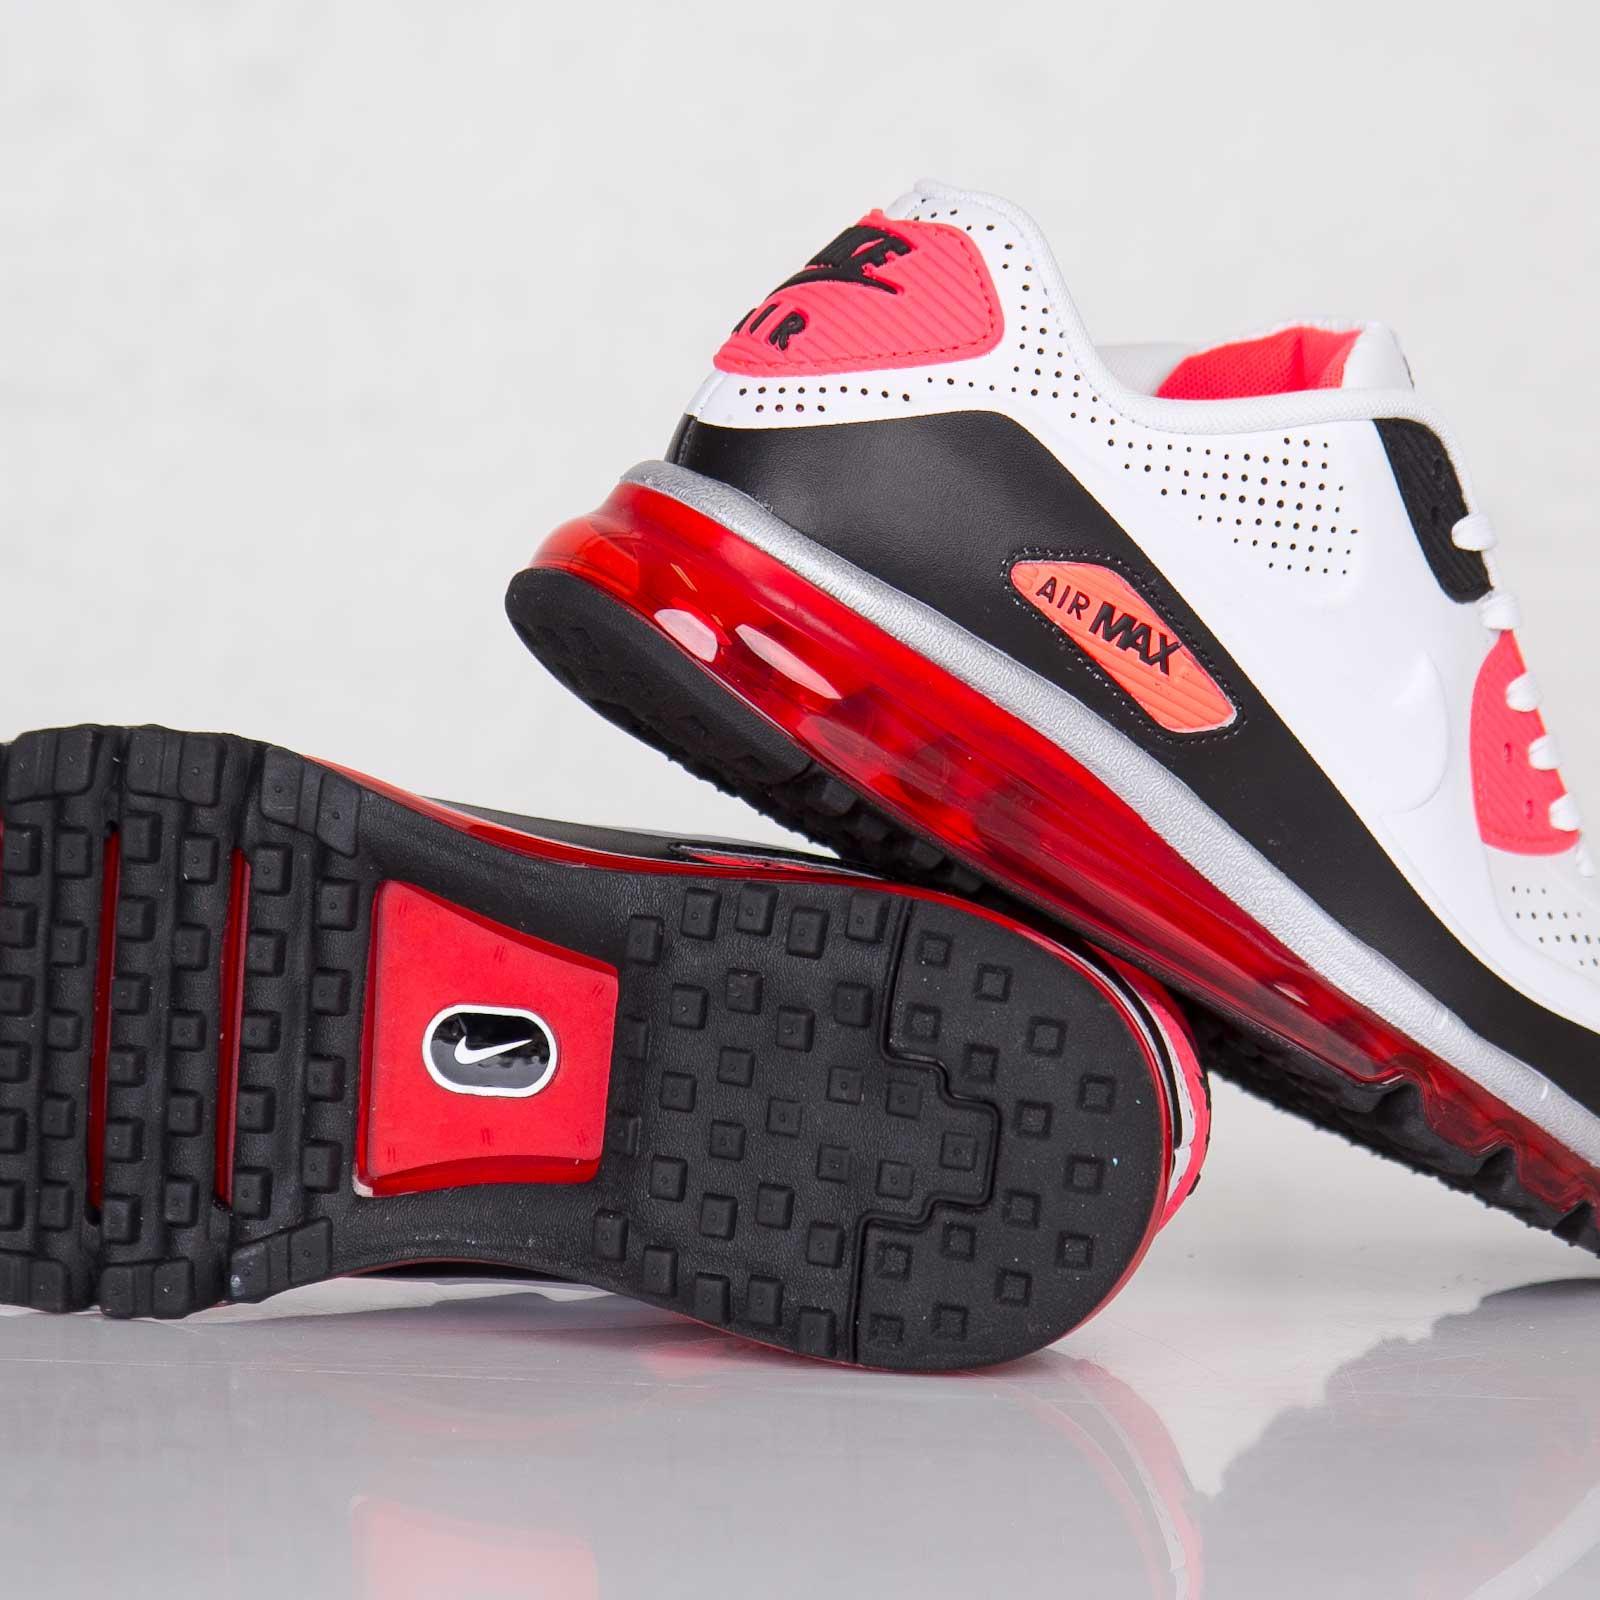 check out a1831 0ef98 ... Nike Air Max 90-2014 LTR QS ...